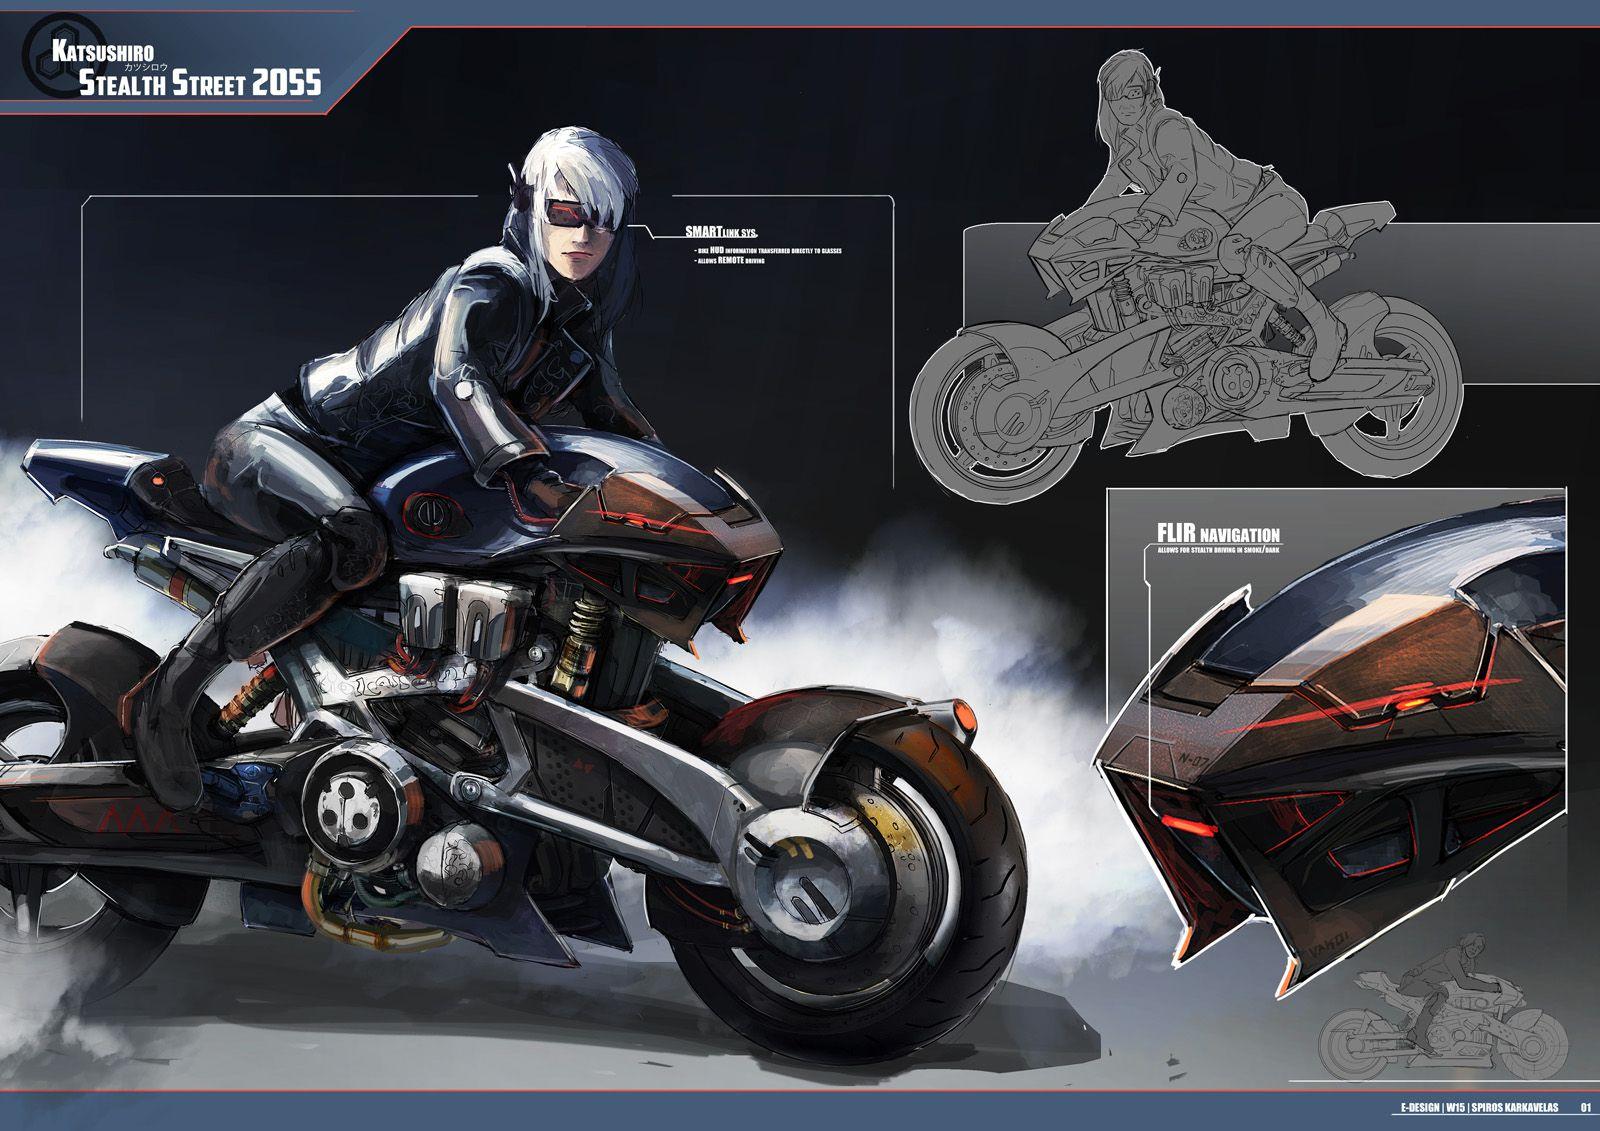 Samurai Cyberpunk Character Stealth Street 2055 Futuristic Motorcycle Katsushiro Futuristic Motorcycle Concept Motorcycles Motorbike Illustration